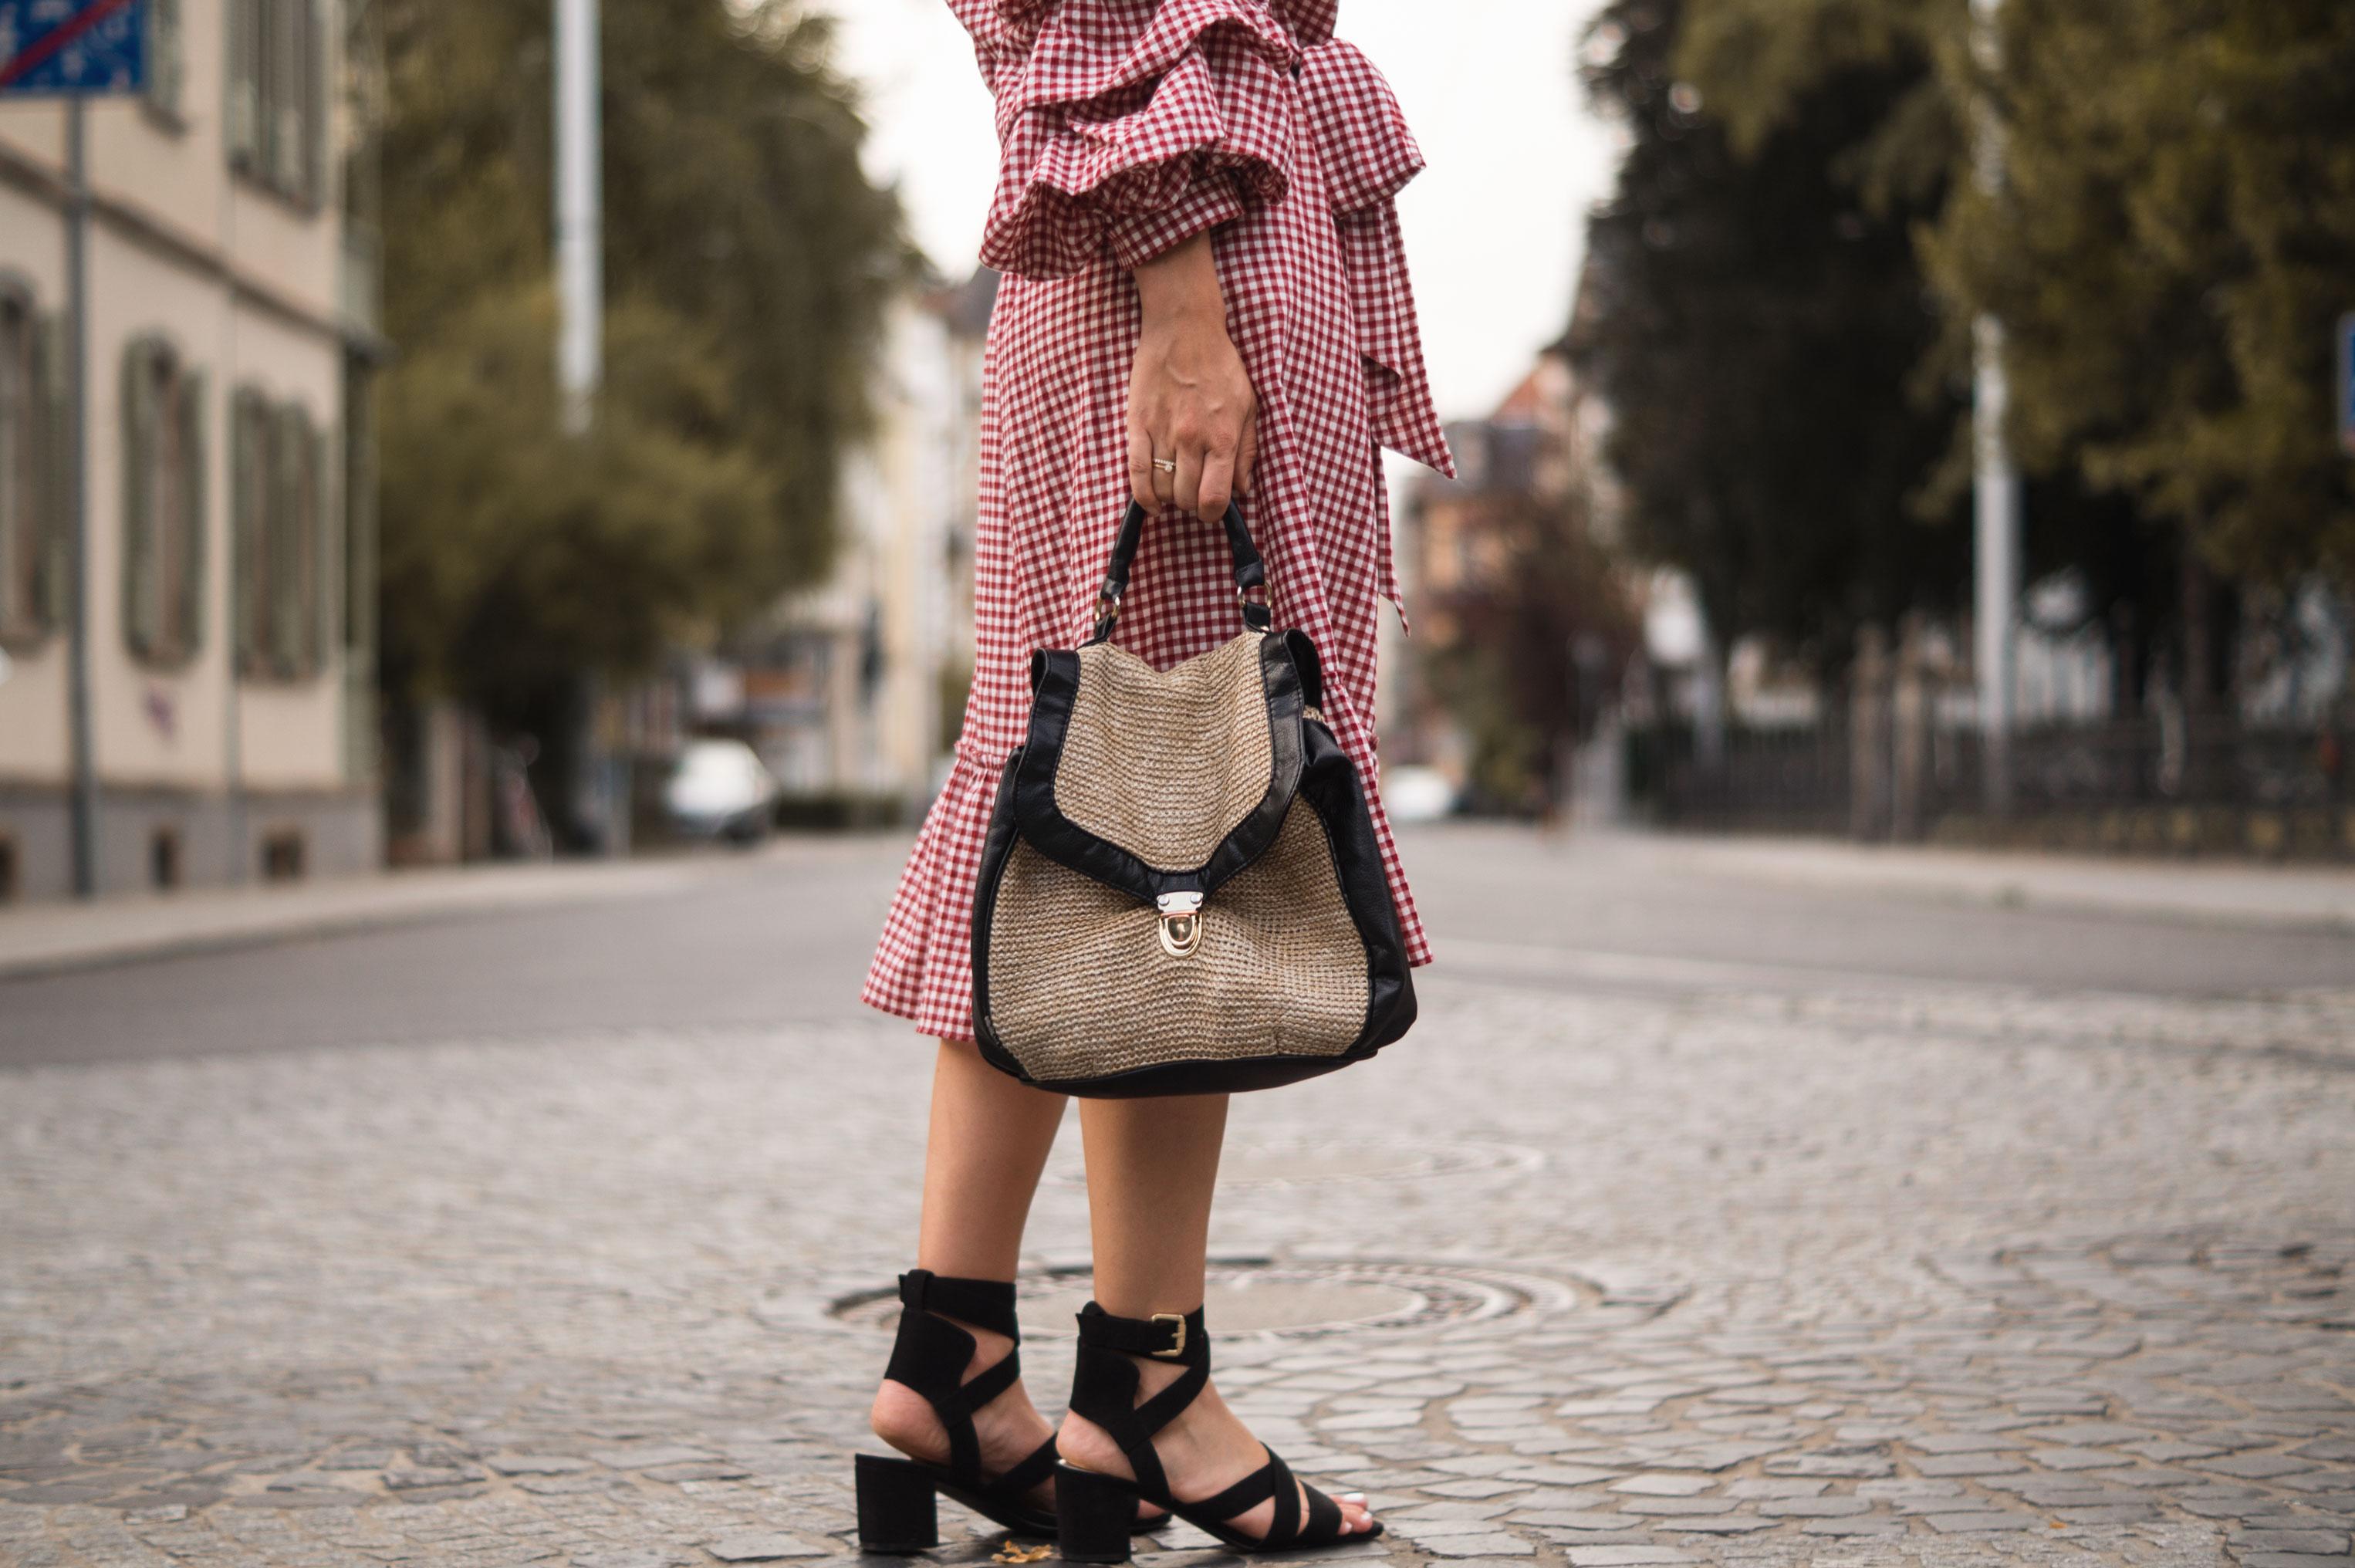 rotes Karokleid Zara off shoulder gingham Streetstyle Heidelberg Sariety Modeblog Fashionblogger-6